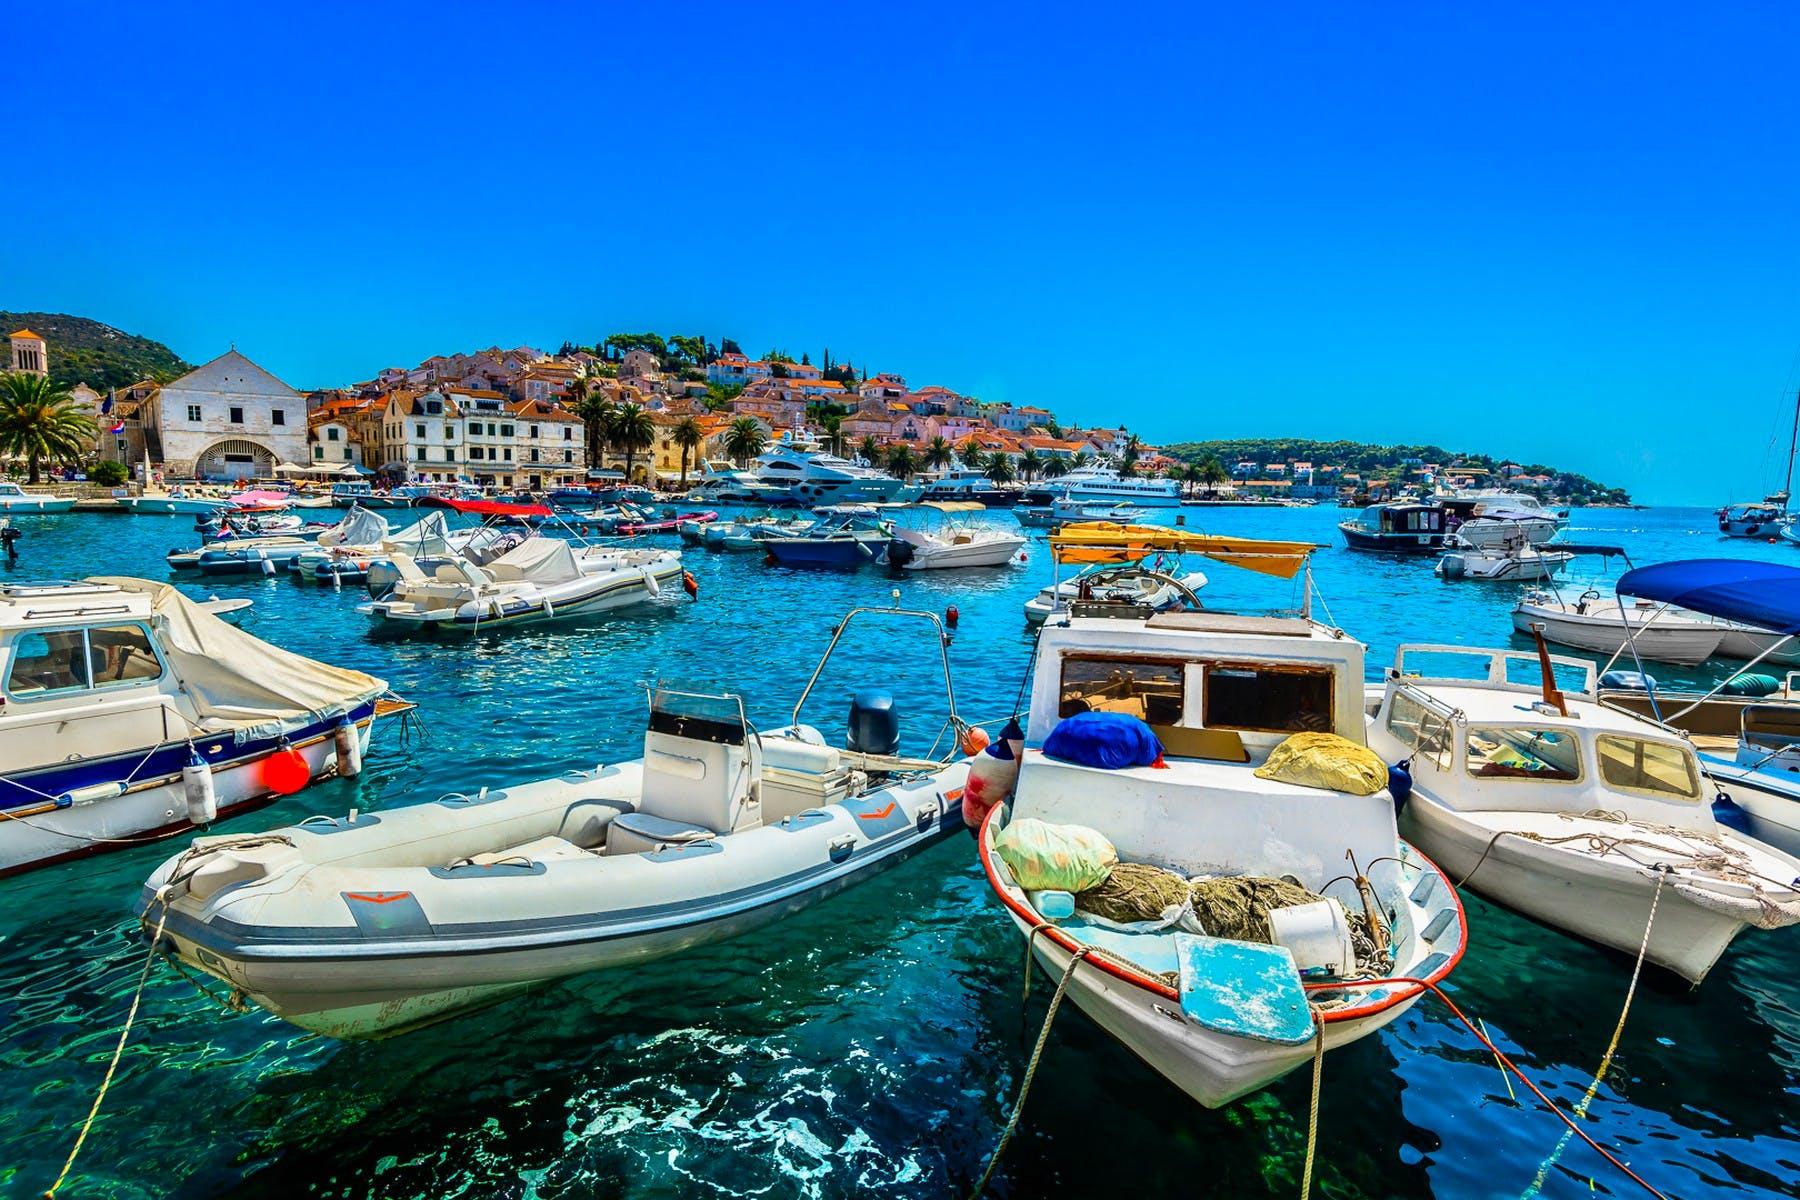 Mesmerizing blue waters of city Hvar